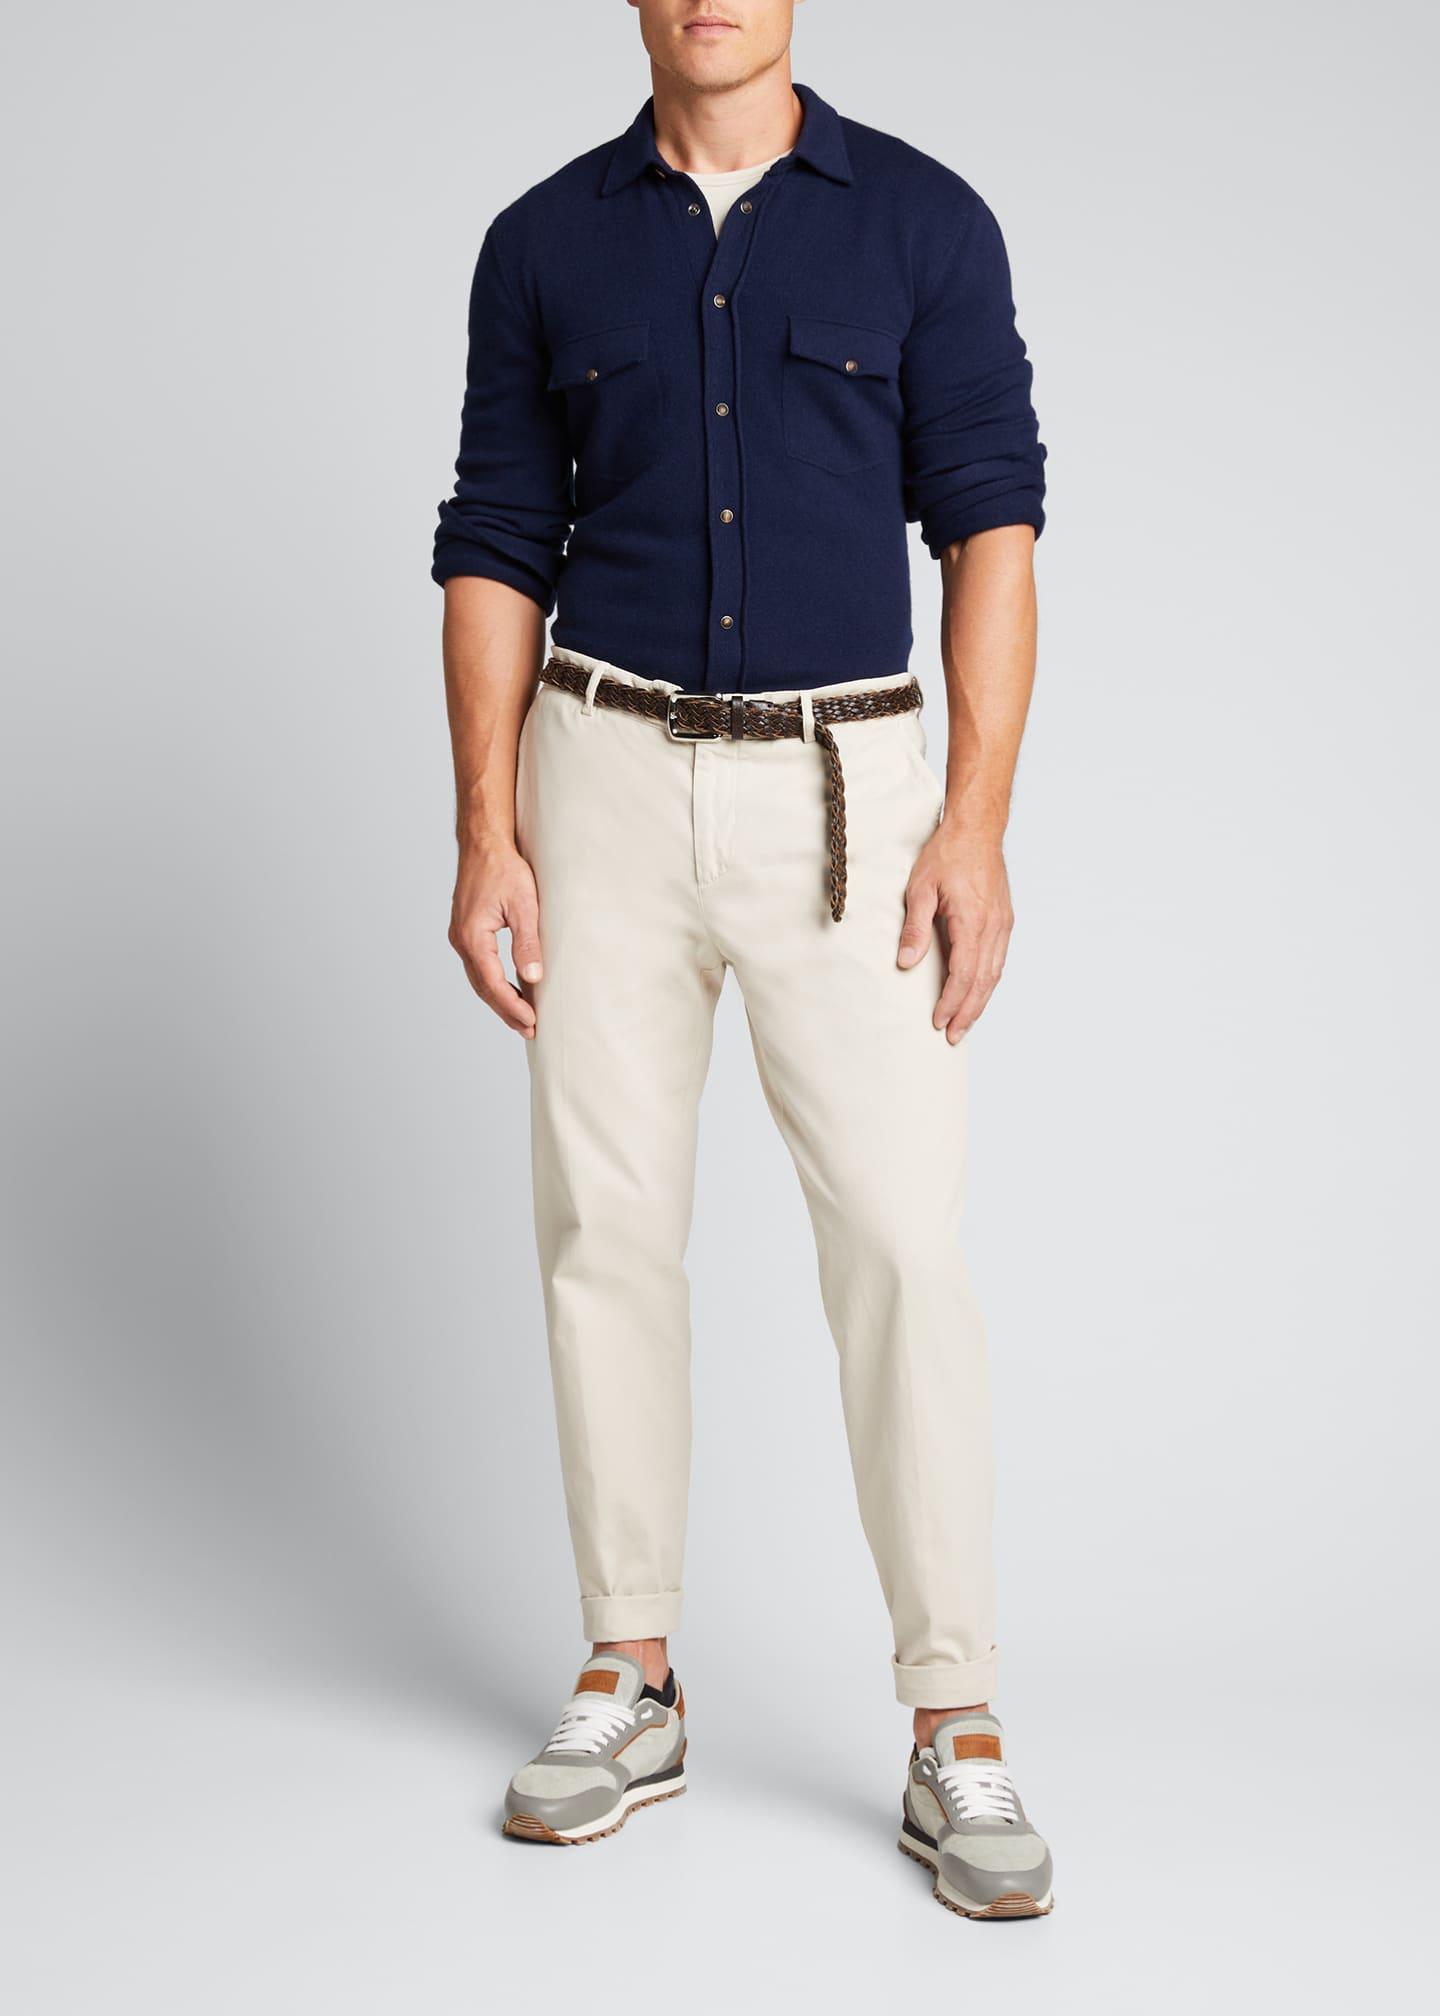 Brunello Cucinelli Men's Western-Style Shirt Cardigan